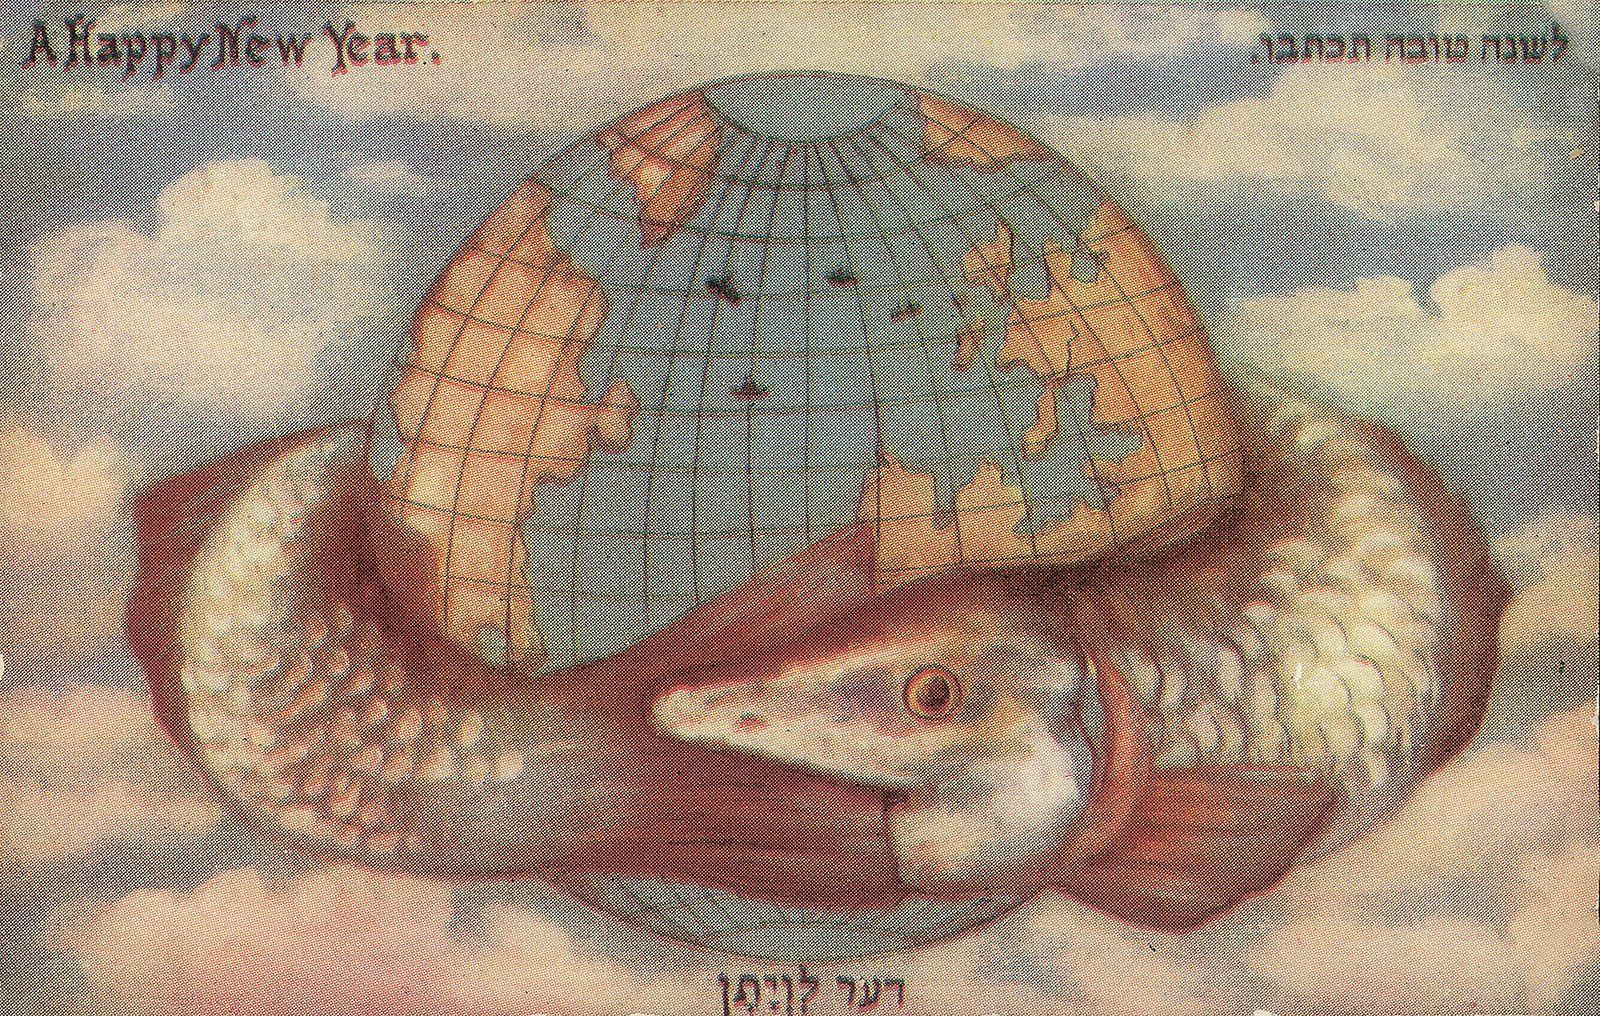 Group Of C 89 Postcards Rosh Hashana New Year Greetings In English